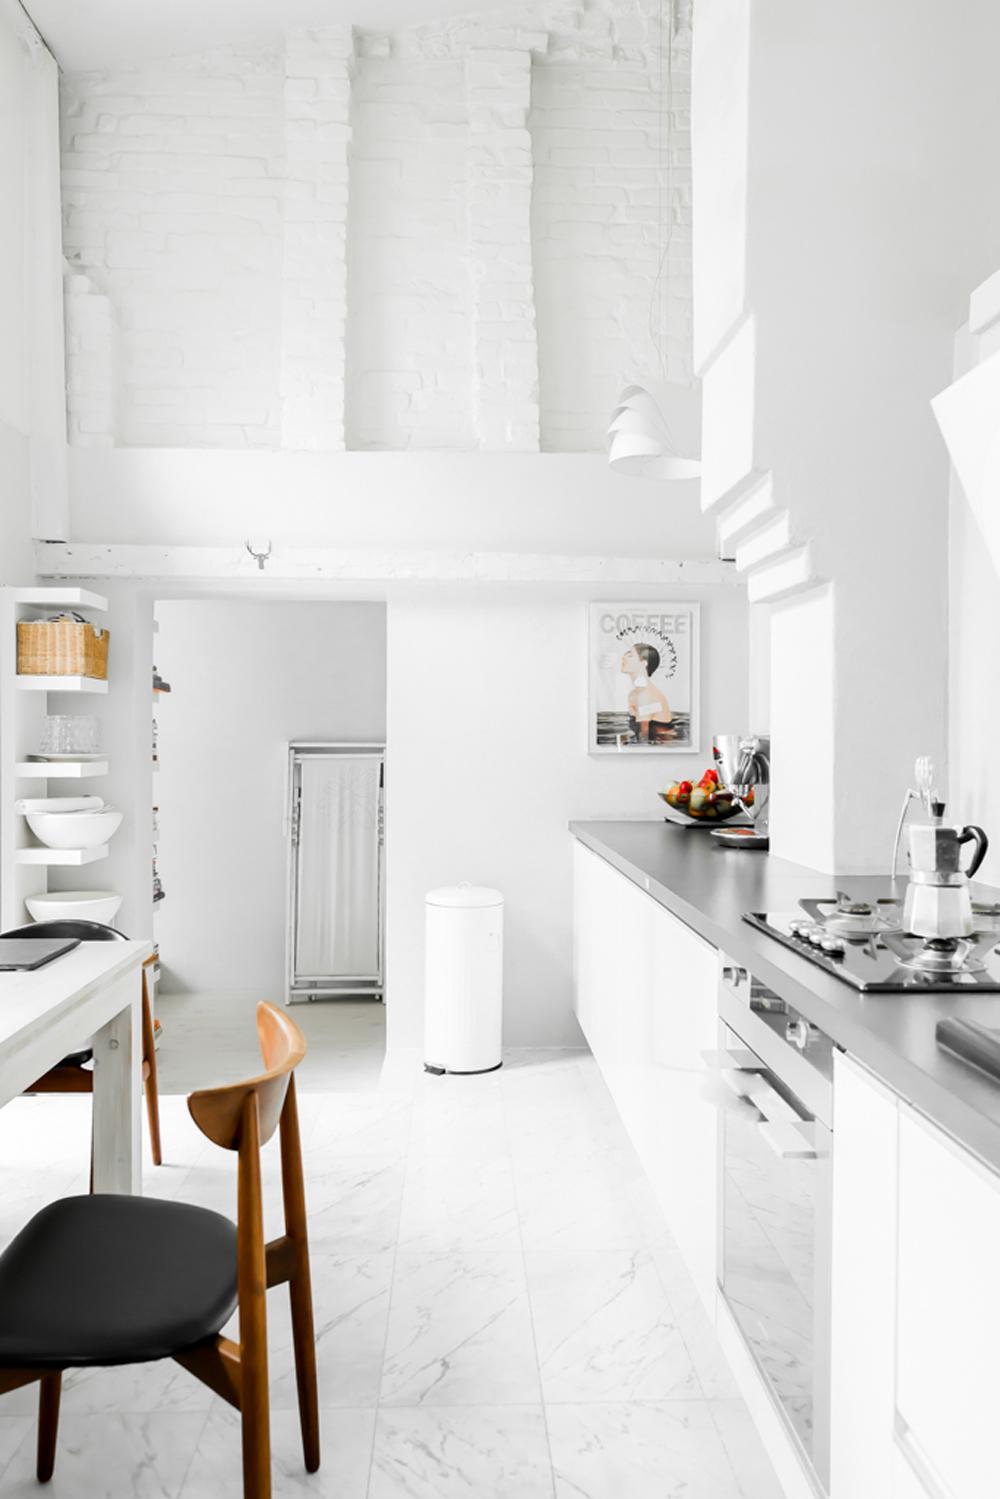 Oracle, Fox, Sunday, Sanctuary, Polish, Farmhouse, White, Minimalist, Interior, Indoor, Plants, Scandinavian, Style, Living, All, White, Kitchen